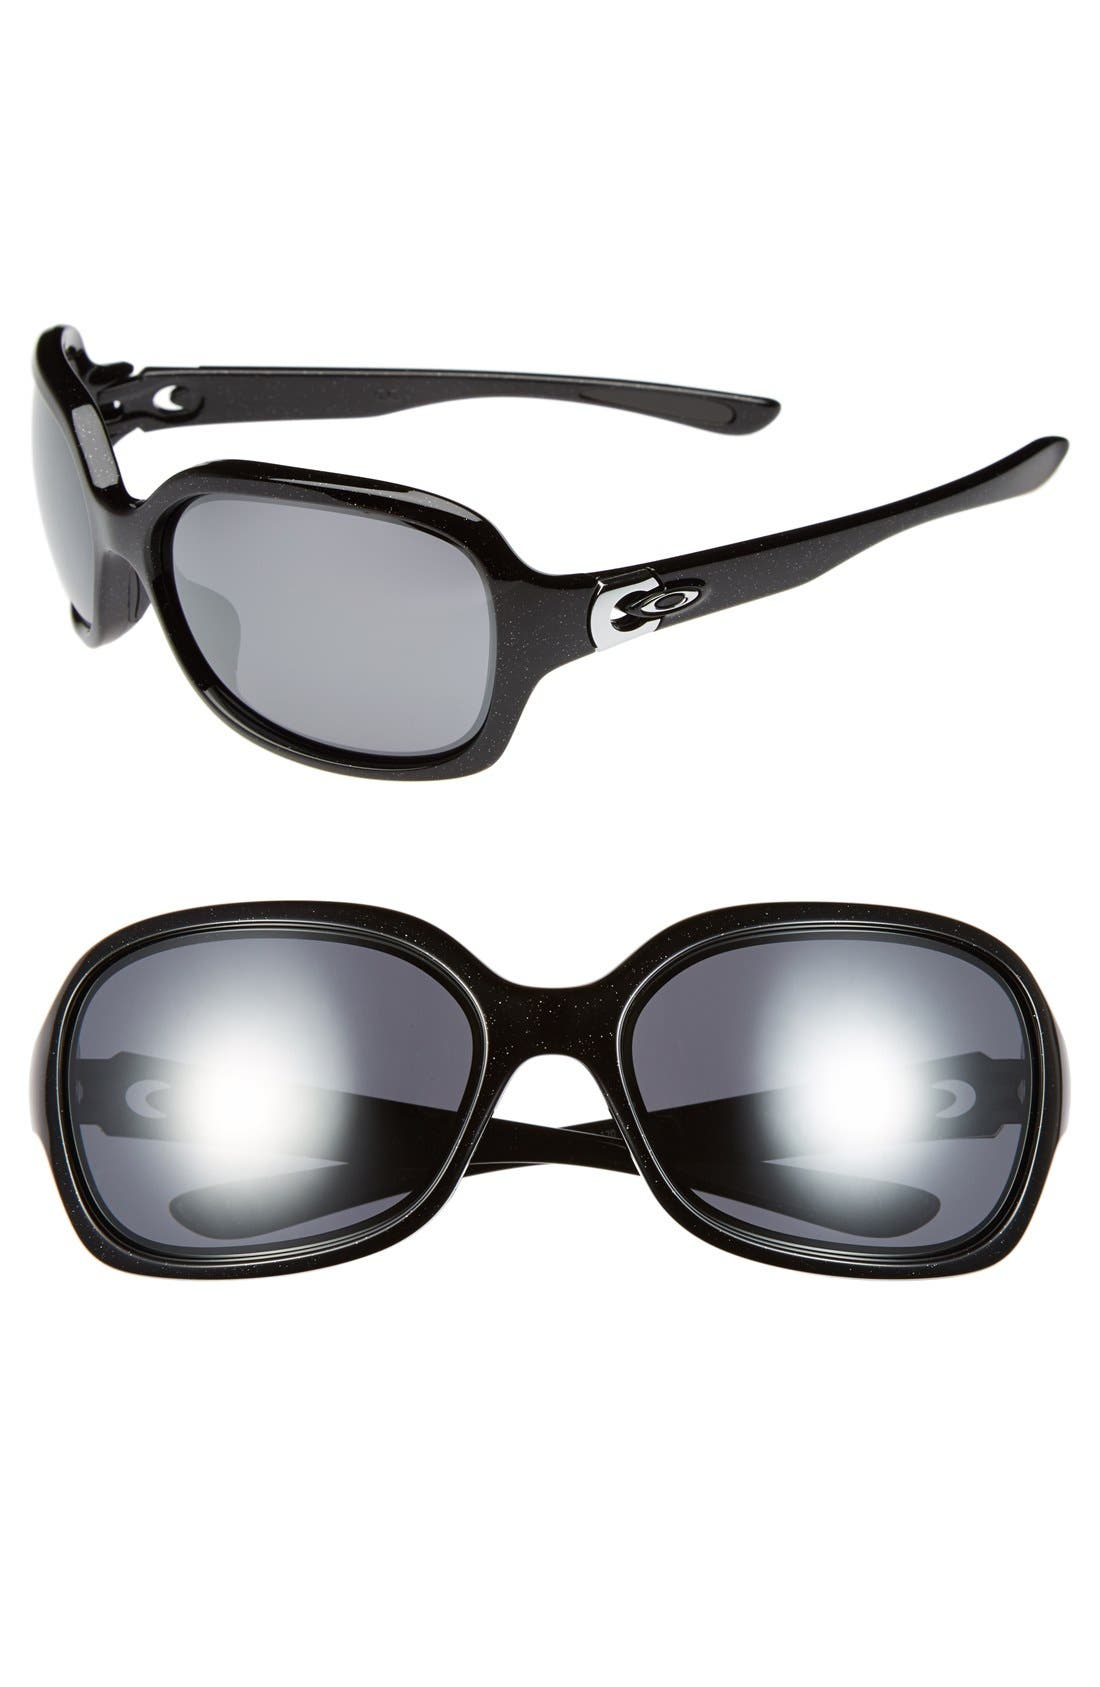 Main Image - Oakley 'Pulse' 61mm Sunglasses